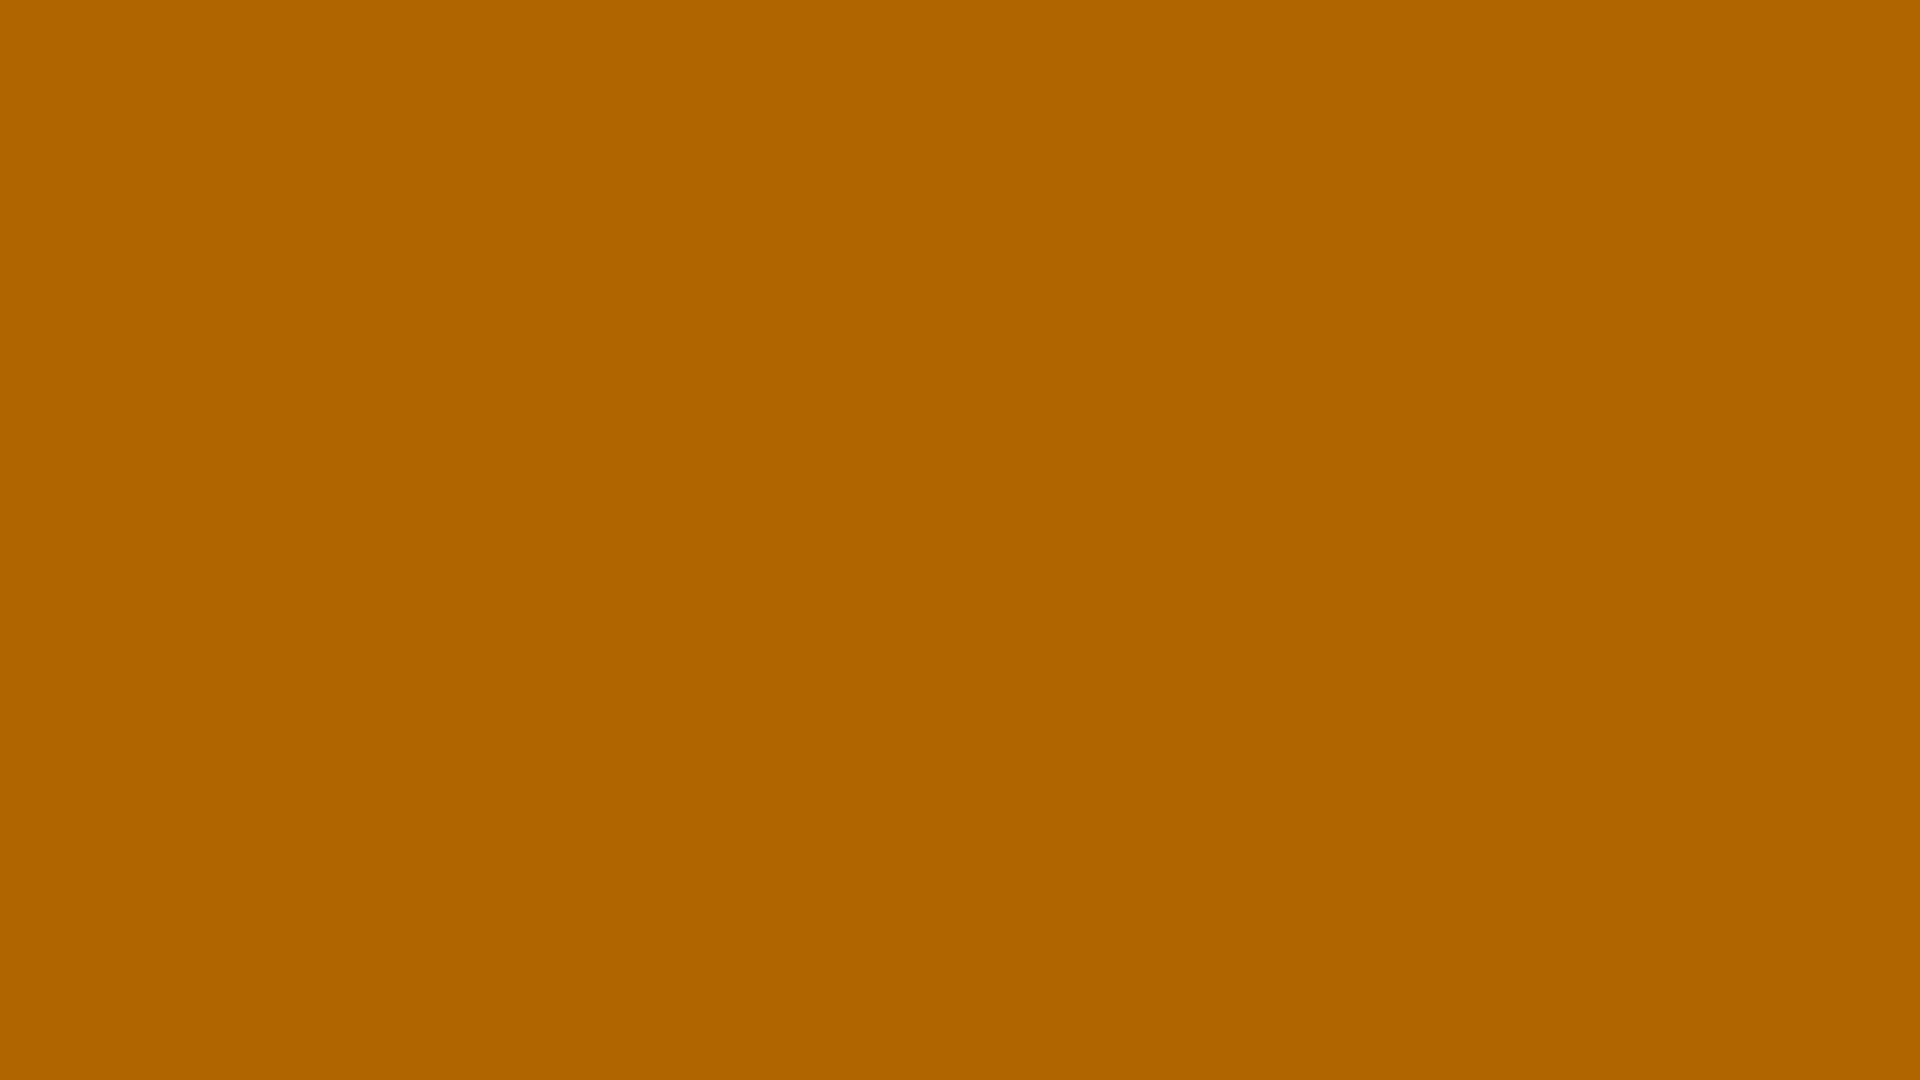 1920x1080 Ginger Solid Color Background